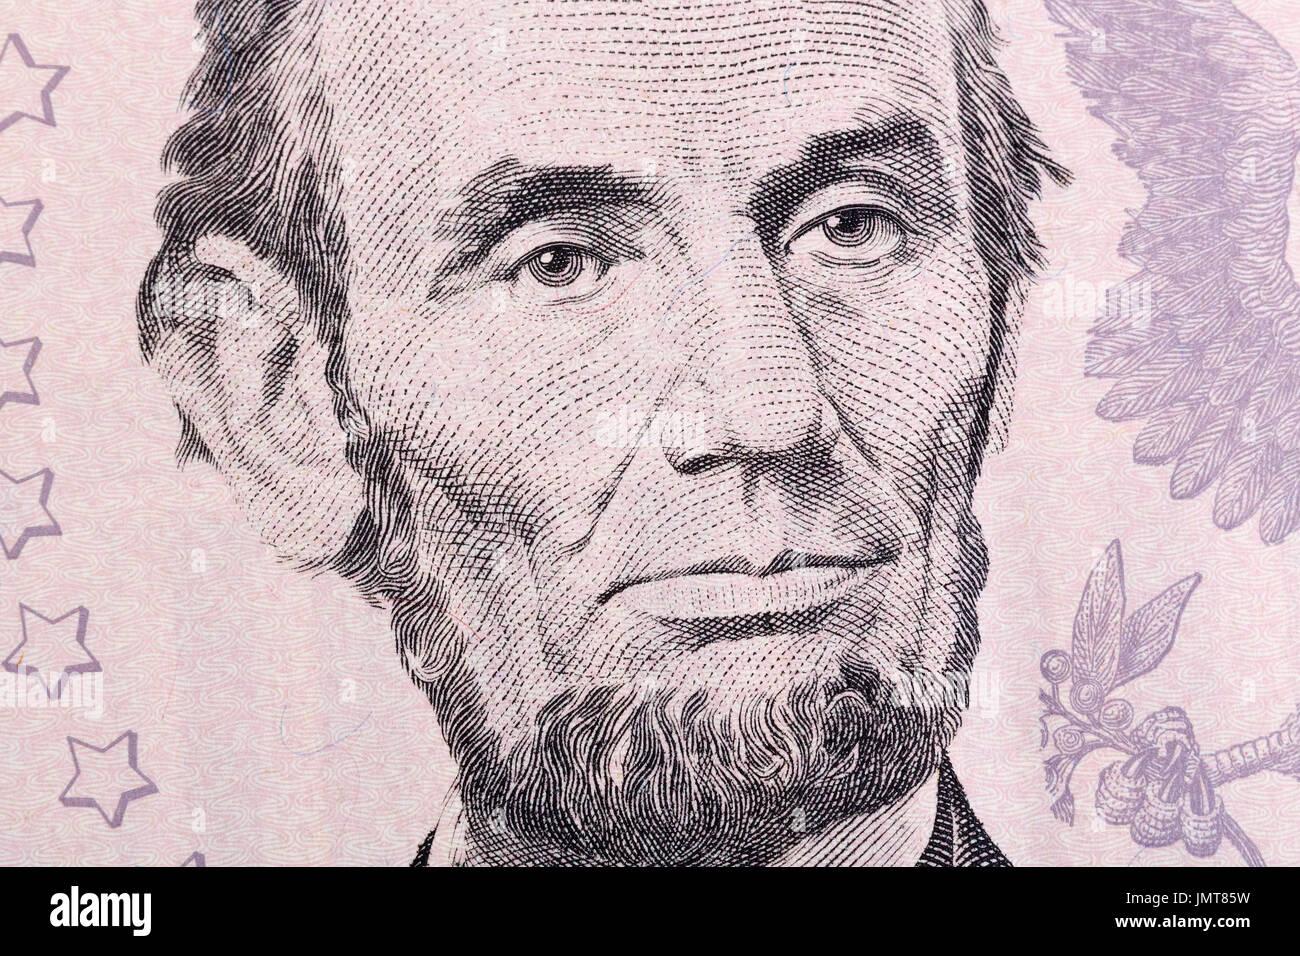 Macro portrait of Abraham Lincoln on five U.S. dollar bill. - Stock Image